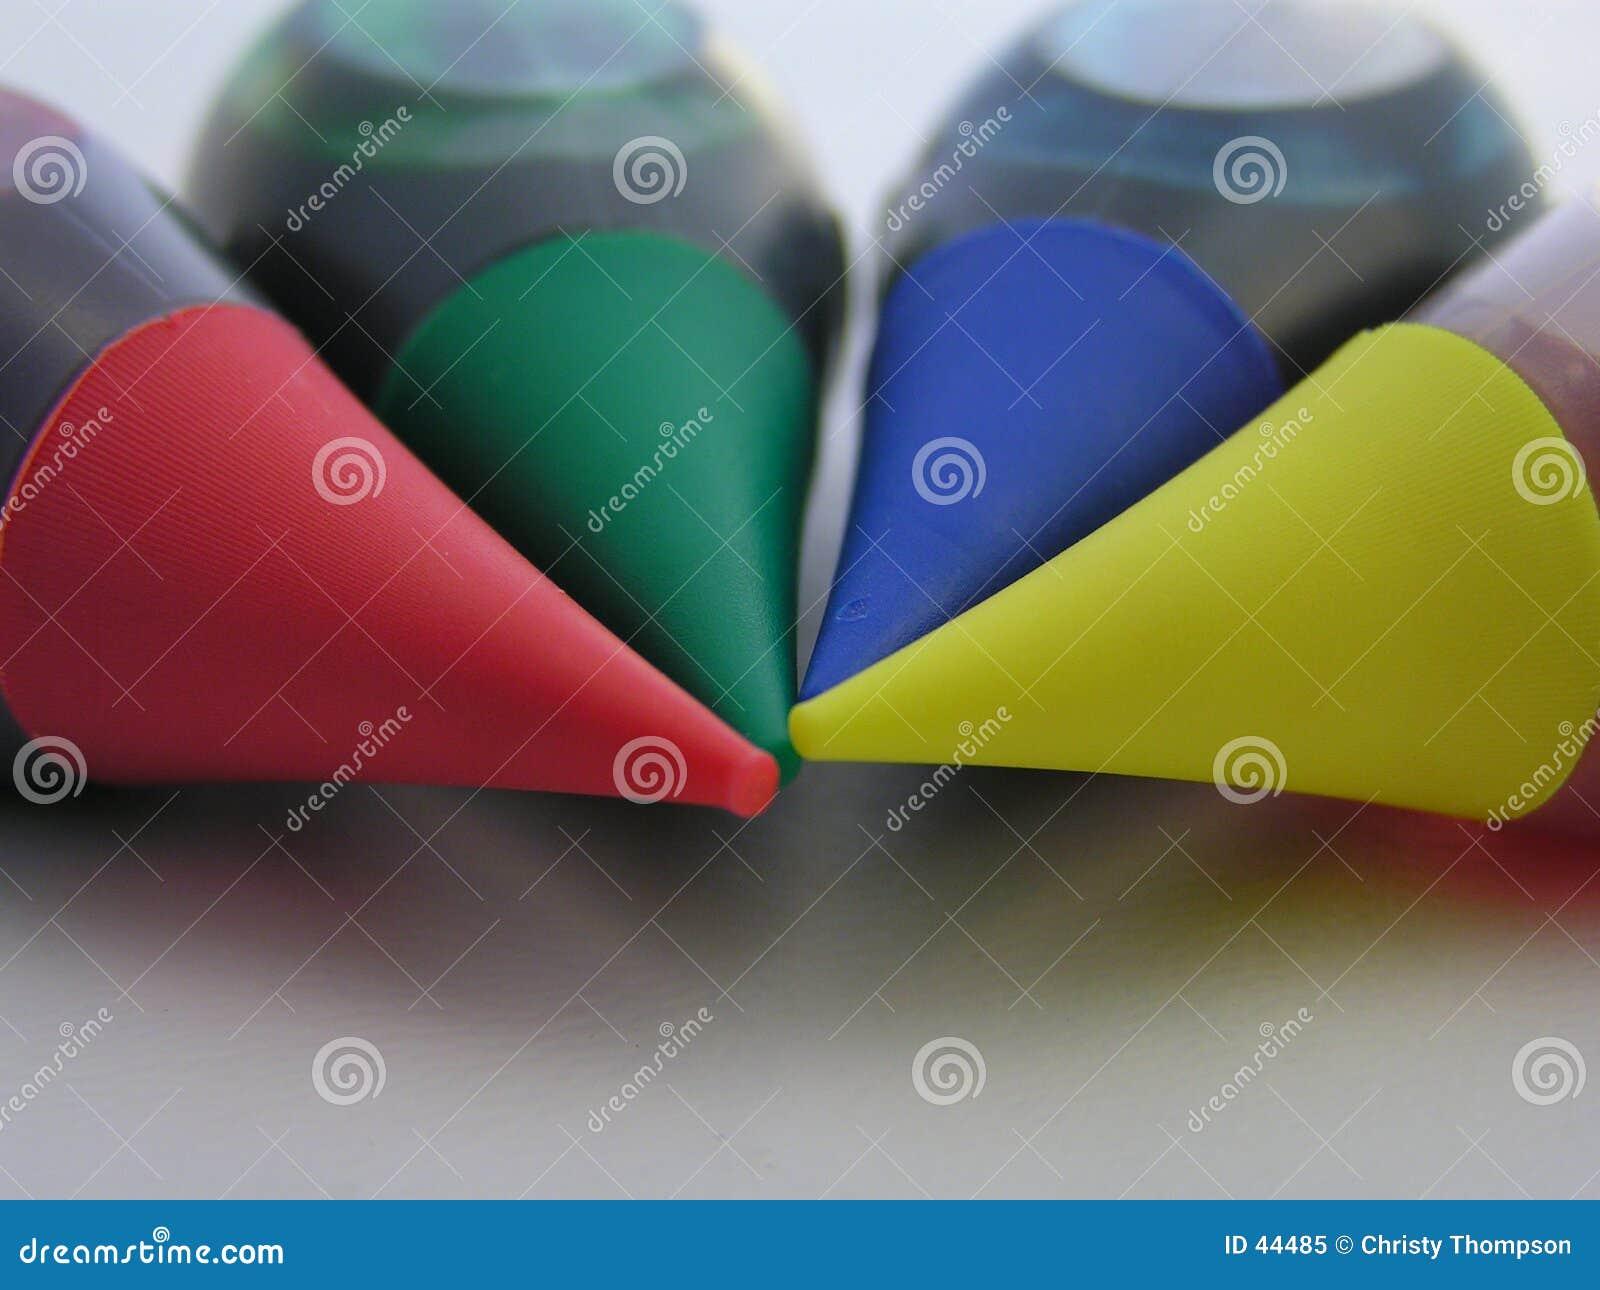 Colors of diversity 2